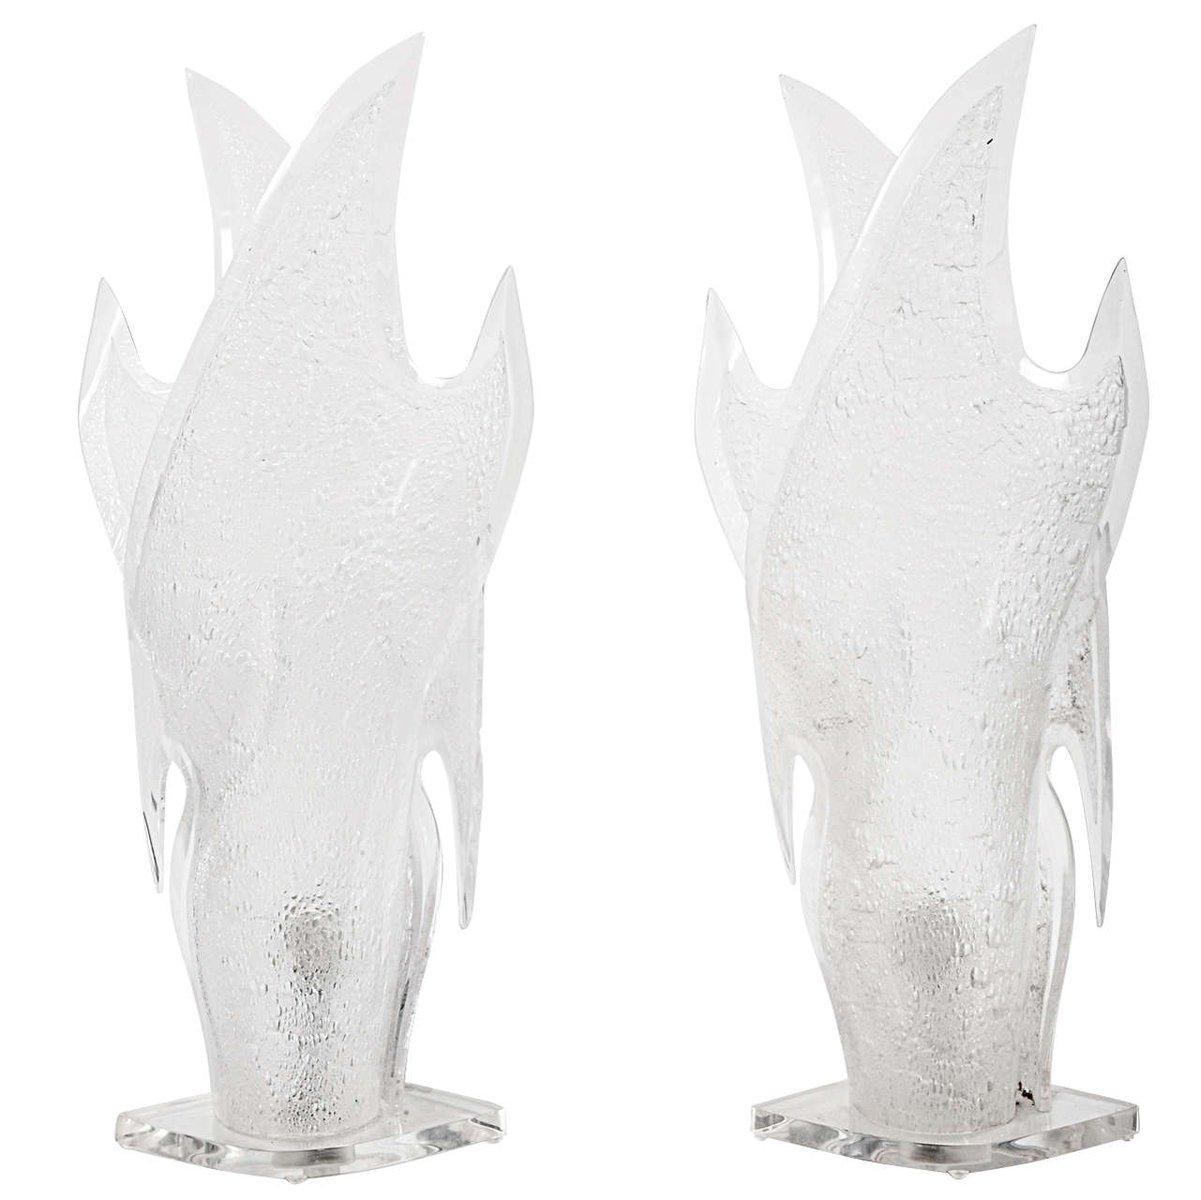 Skulpturale Plexiglas Tischlampen, 1970er, 2er Set